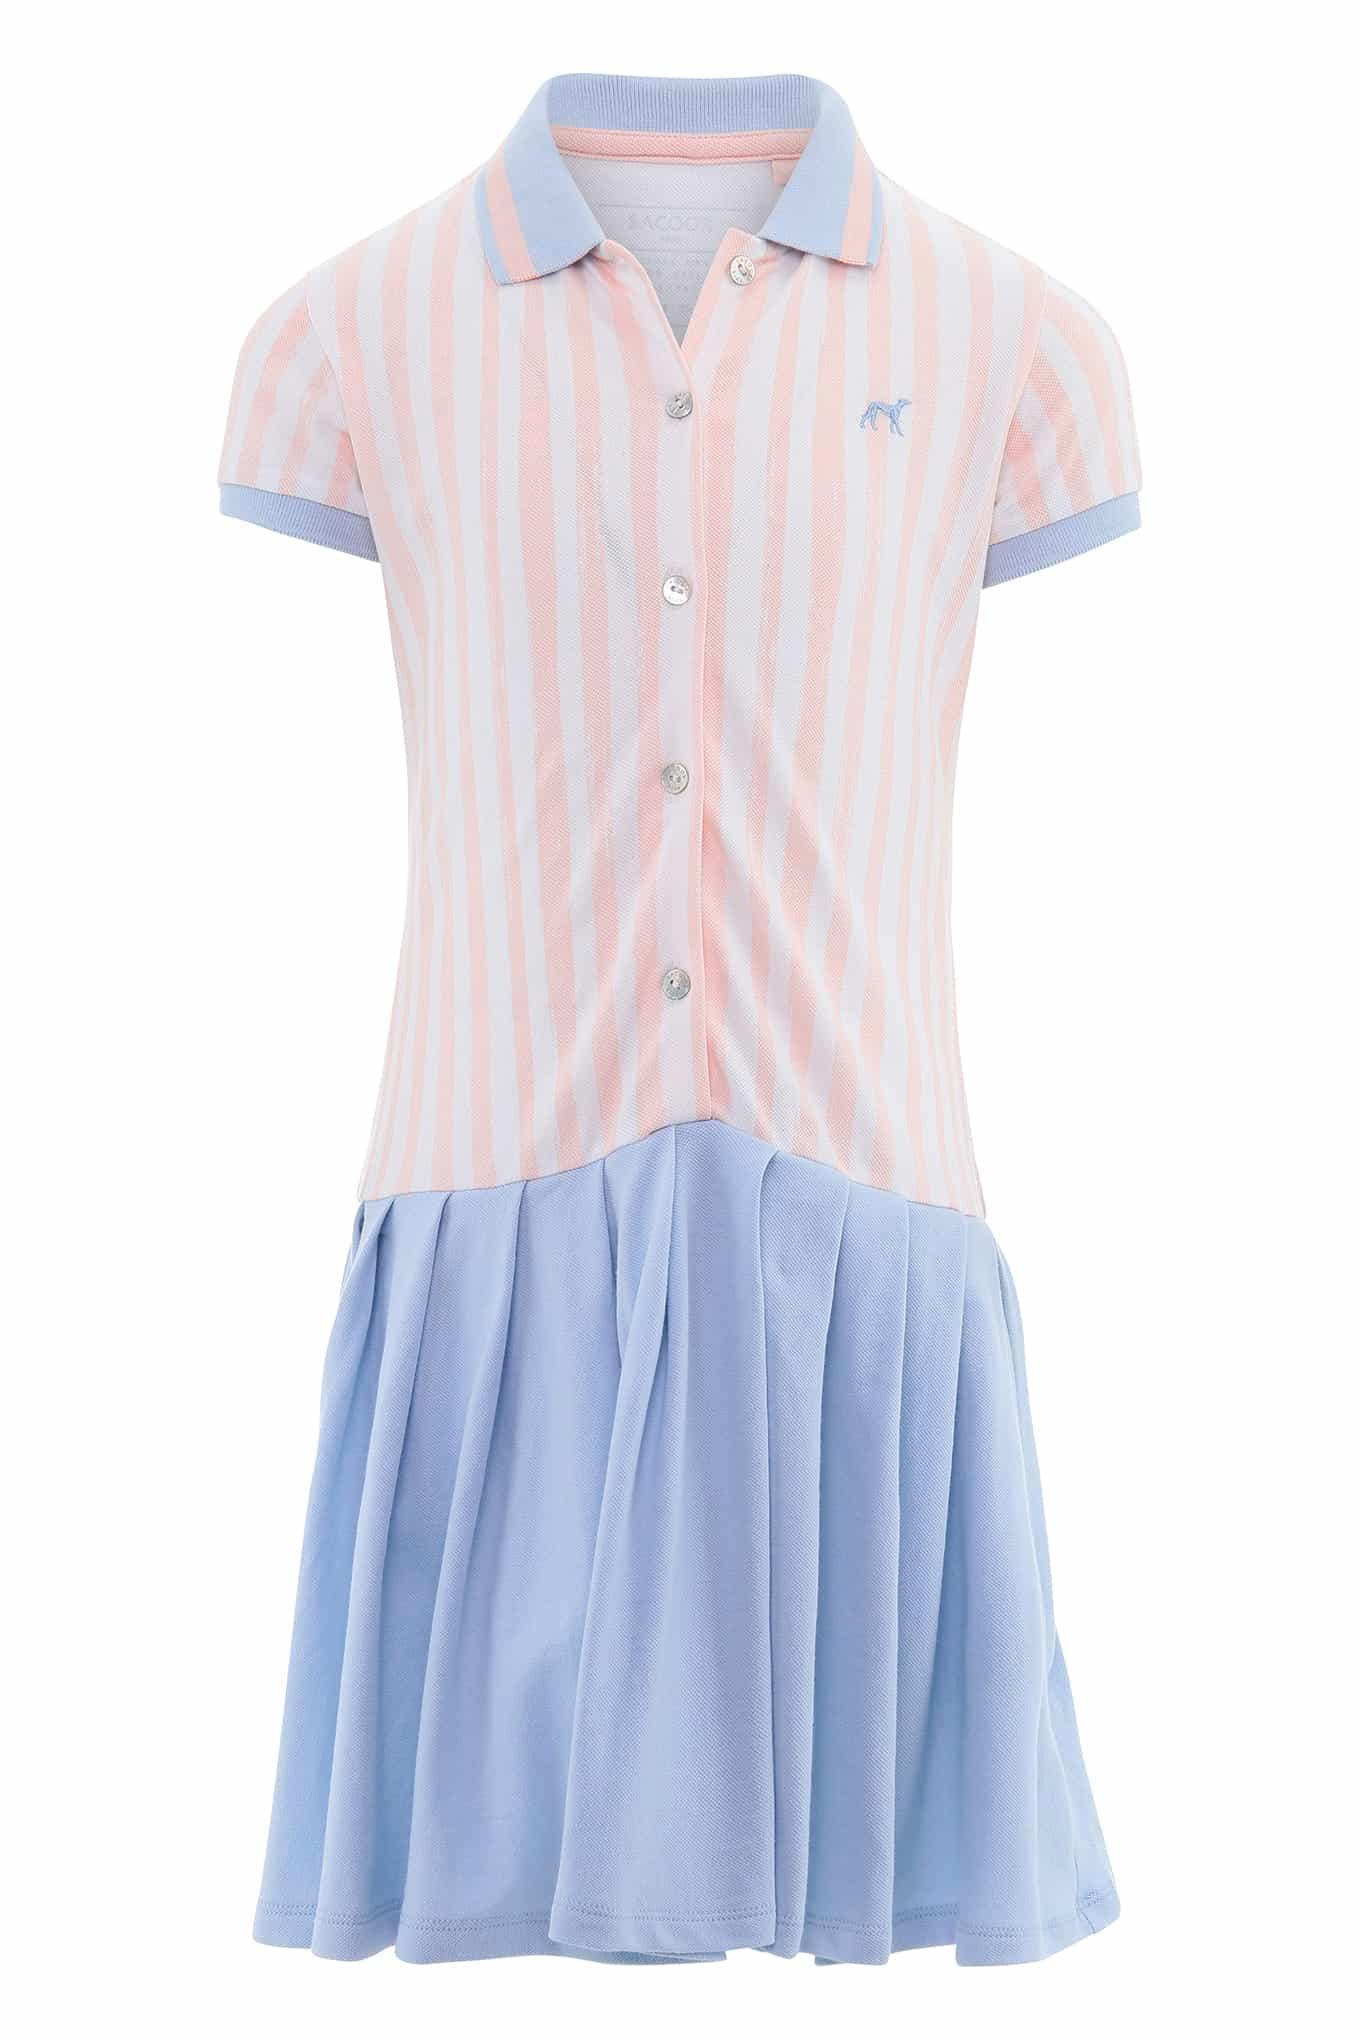 Vestido Piquet Branco Sport Rapariga